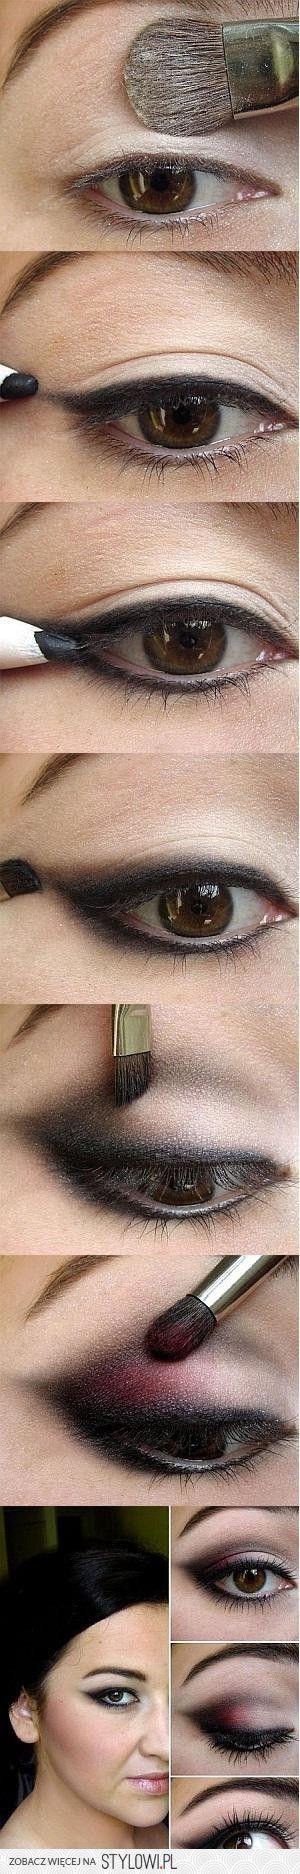 maquilhagem-.pintura de olhos